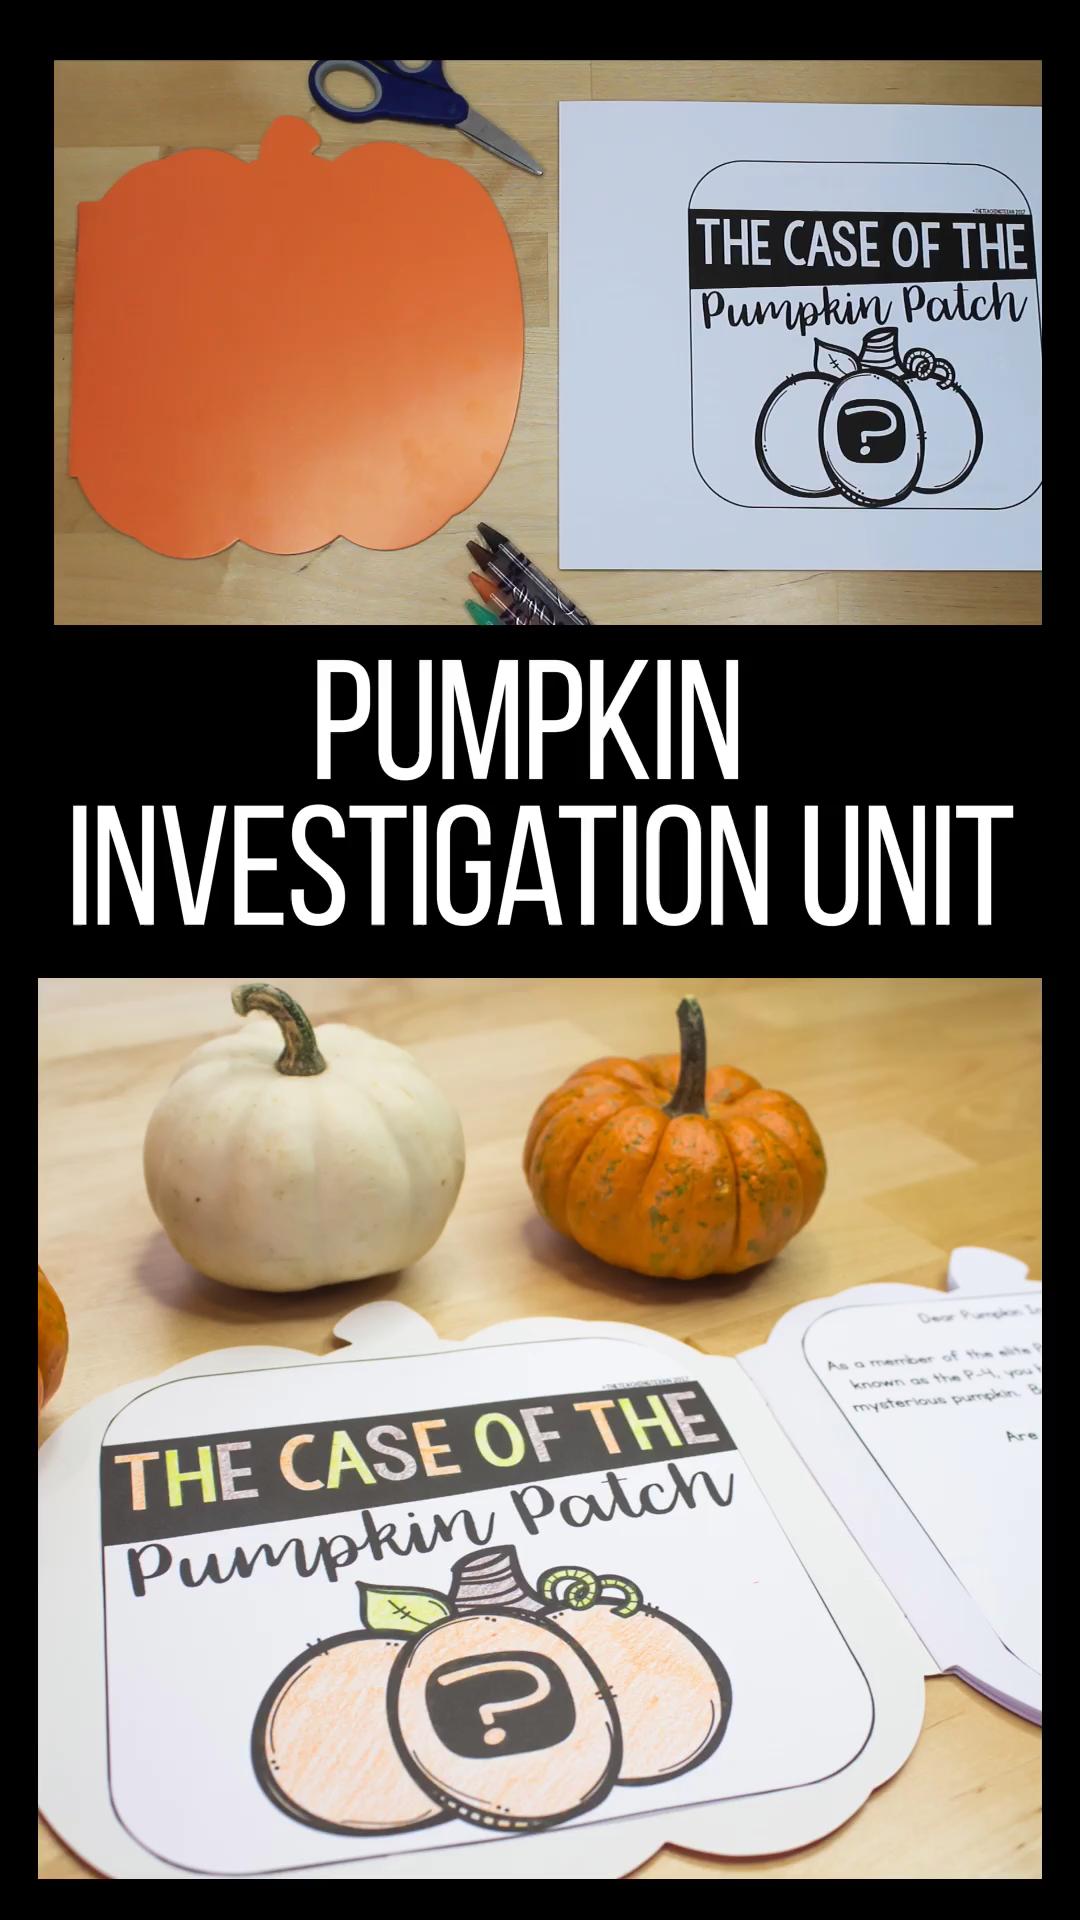 Pumpkin Investigation Unit Video Pumpkin Lessons Pumpkin Investigation Pumpkin Activities [ 1920 x 1080 Pixel ]